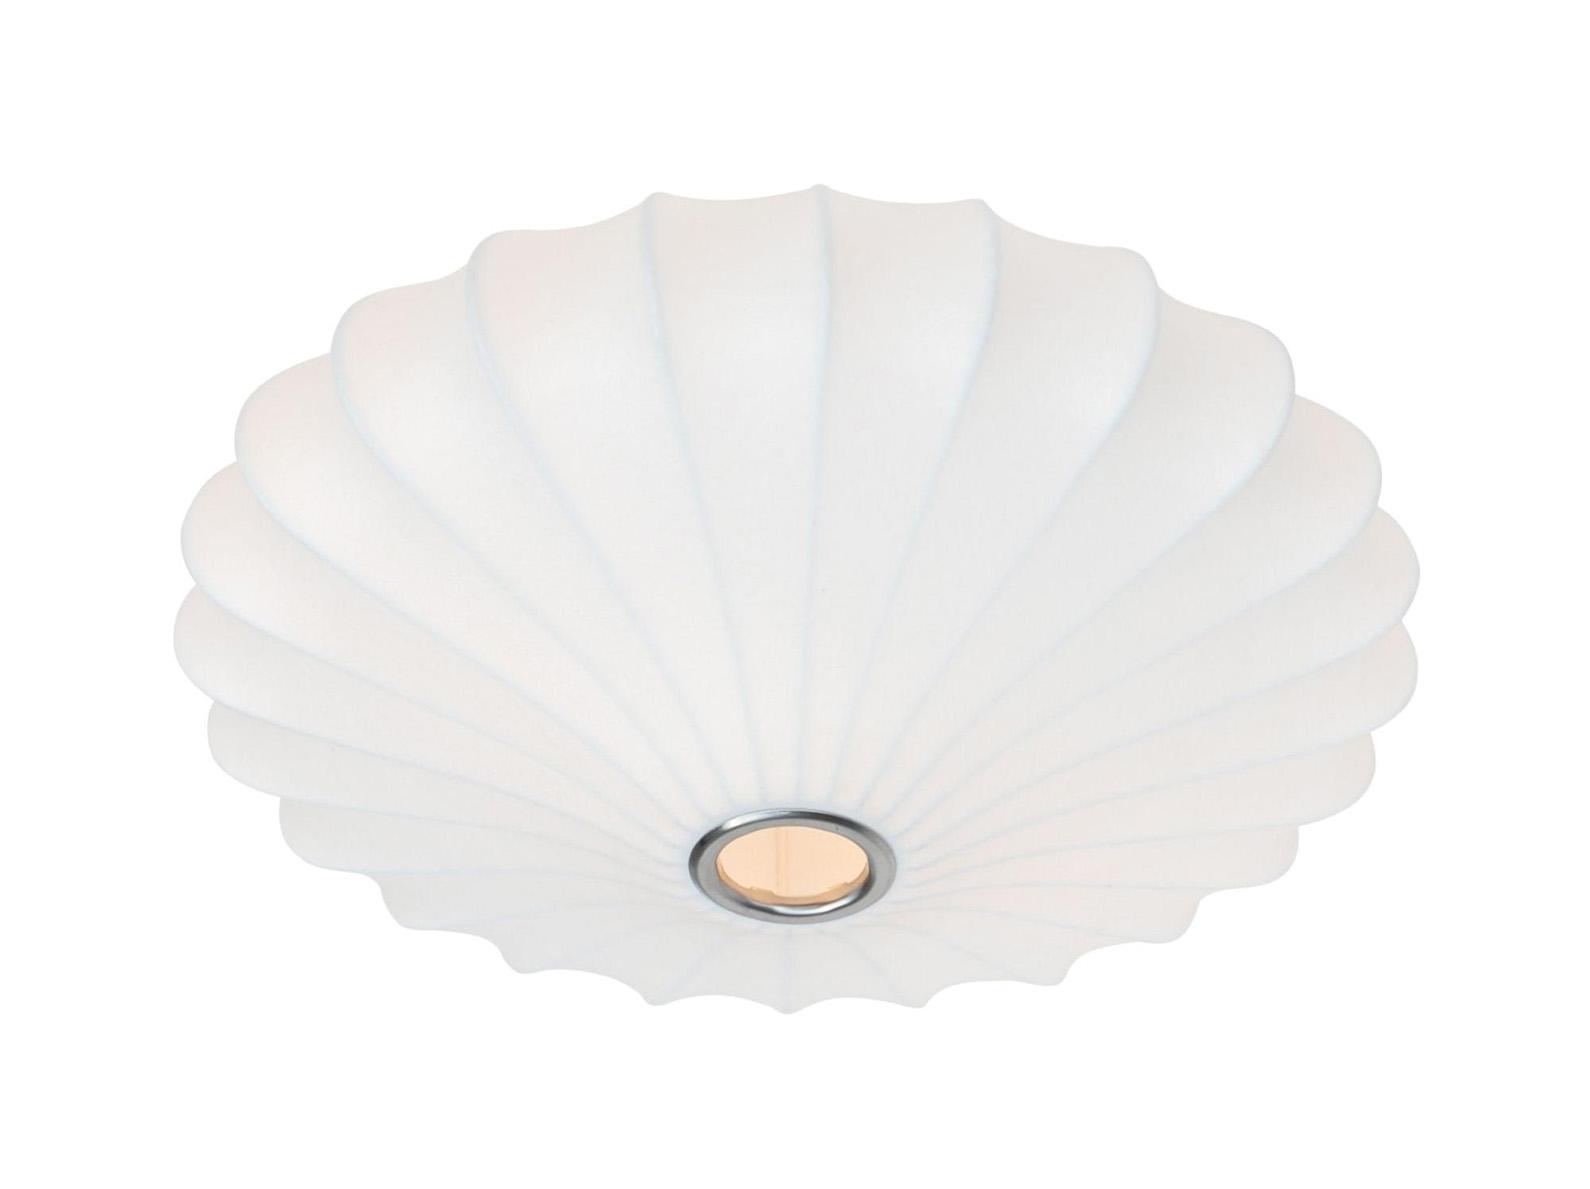 A6090PL-2WH Потолочный светильникA6090PL-2WHA6090PL-2WH Потолочный светильник 2xE27 40W Материал: Арматура: Металл крашенный / Плафон: Ткань Цвет: Арматура: Белый / Плафон: Белый Размер: 17x42x42